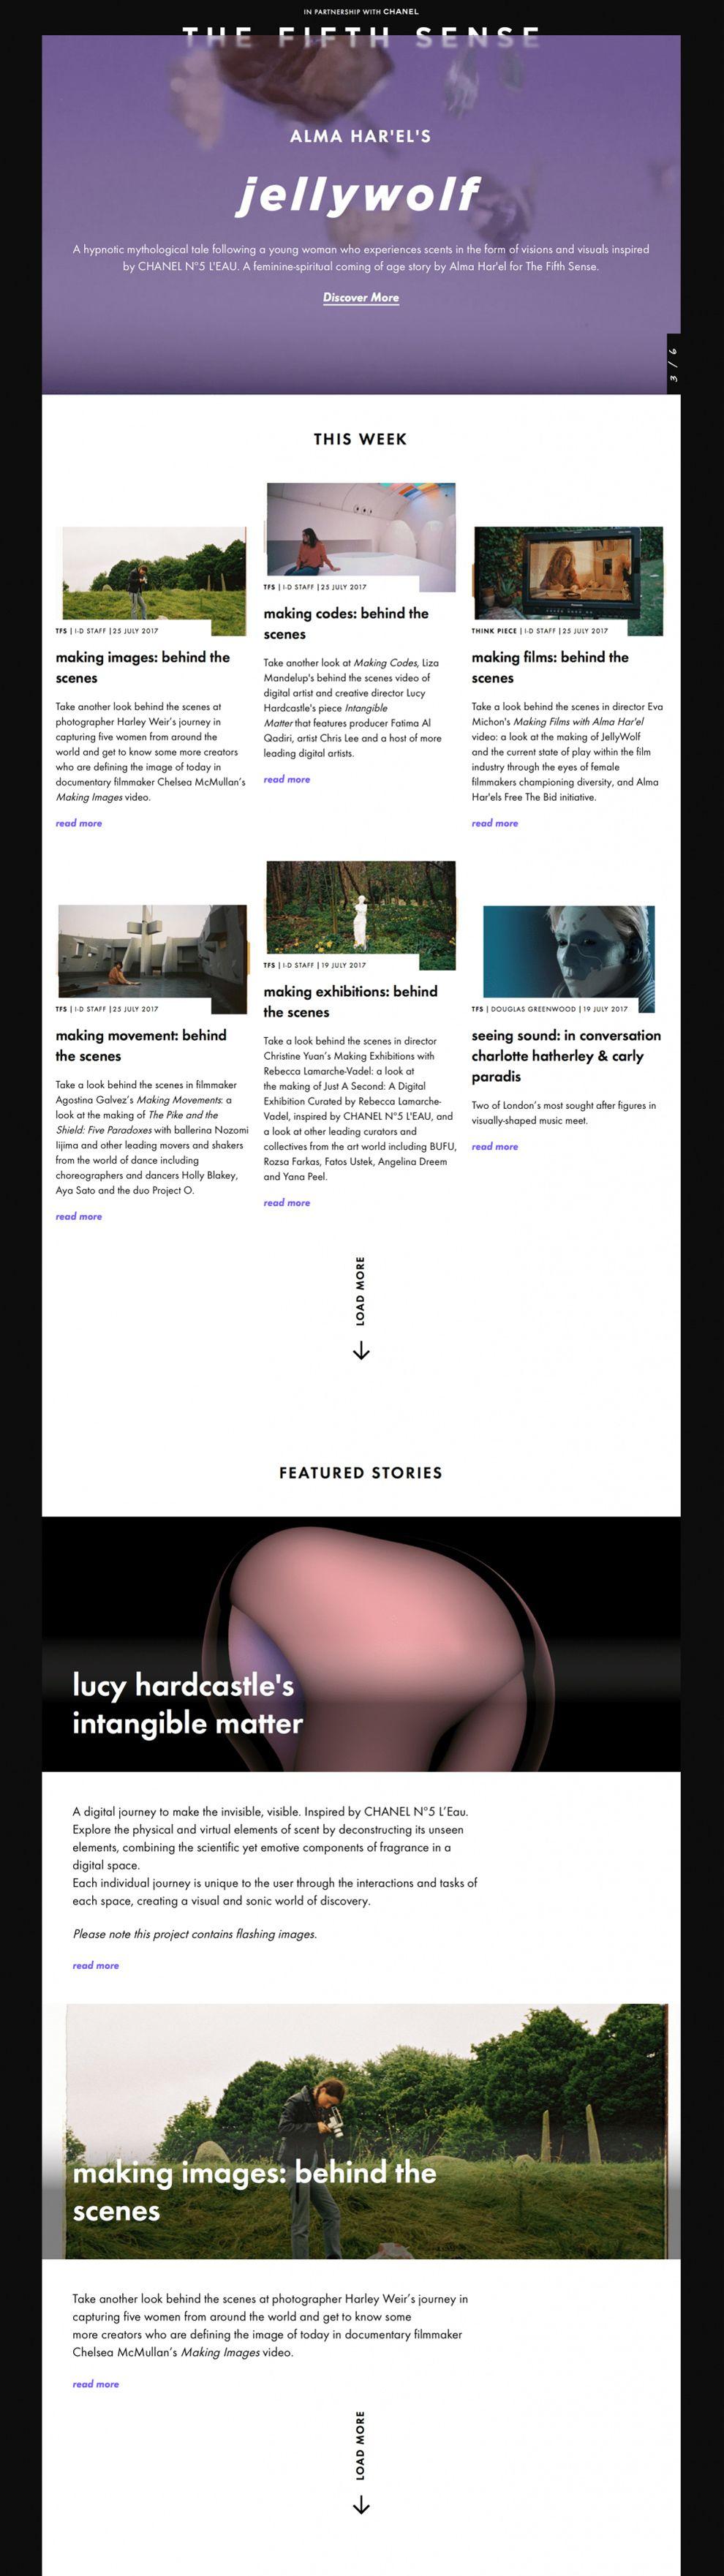 Vice i-D Great Website Design